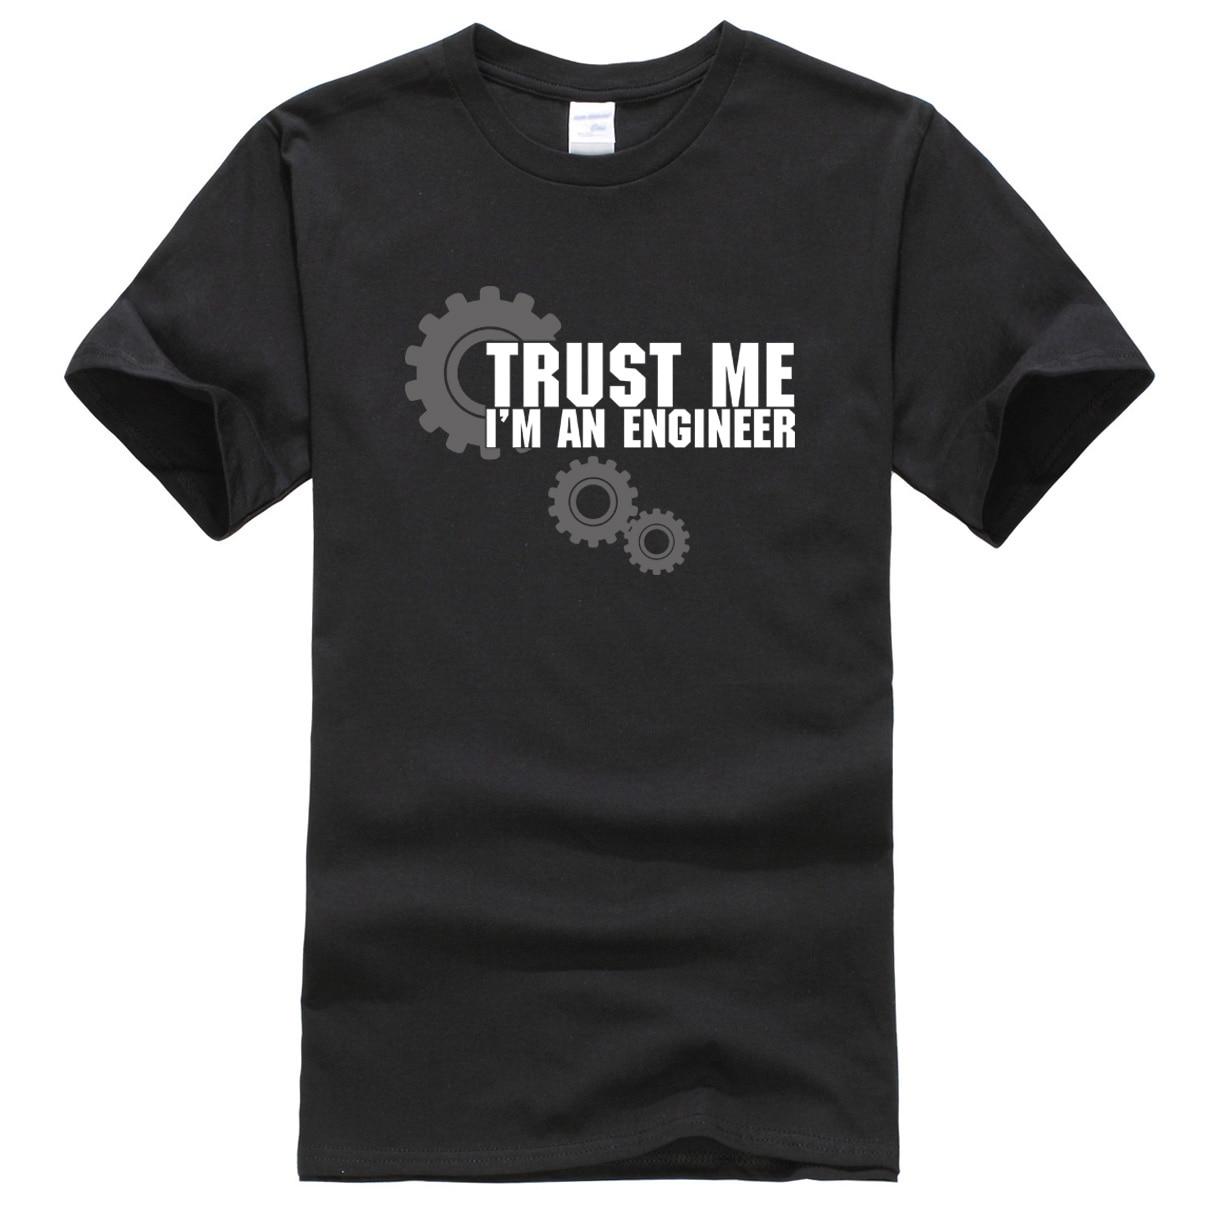 2018 männer T-shirts sommer Trust Me Ich bin Ein Ingenieur gedruckt T-shirt männer sportwear heißer verkauf harajuku crossfit tops t-shirt